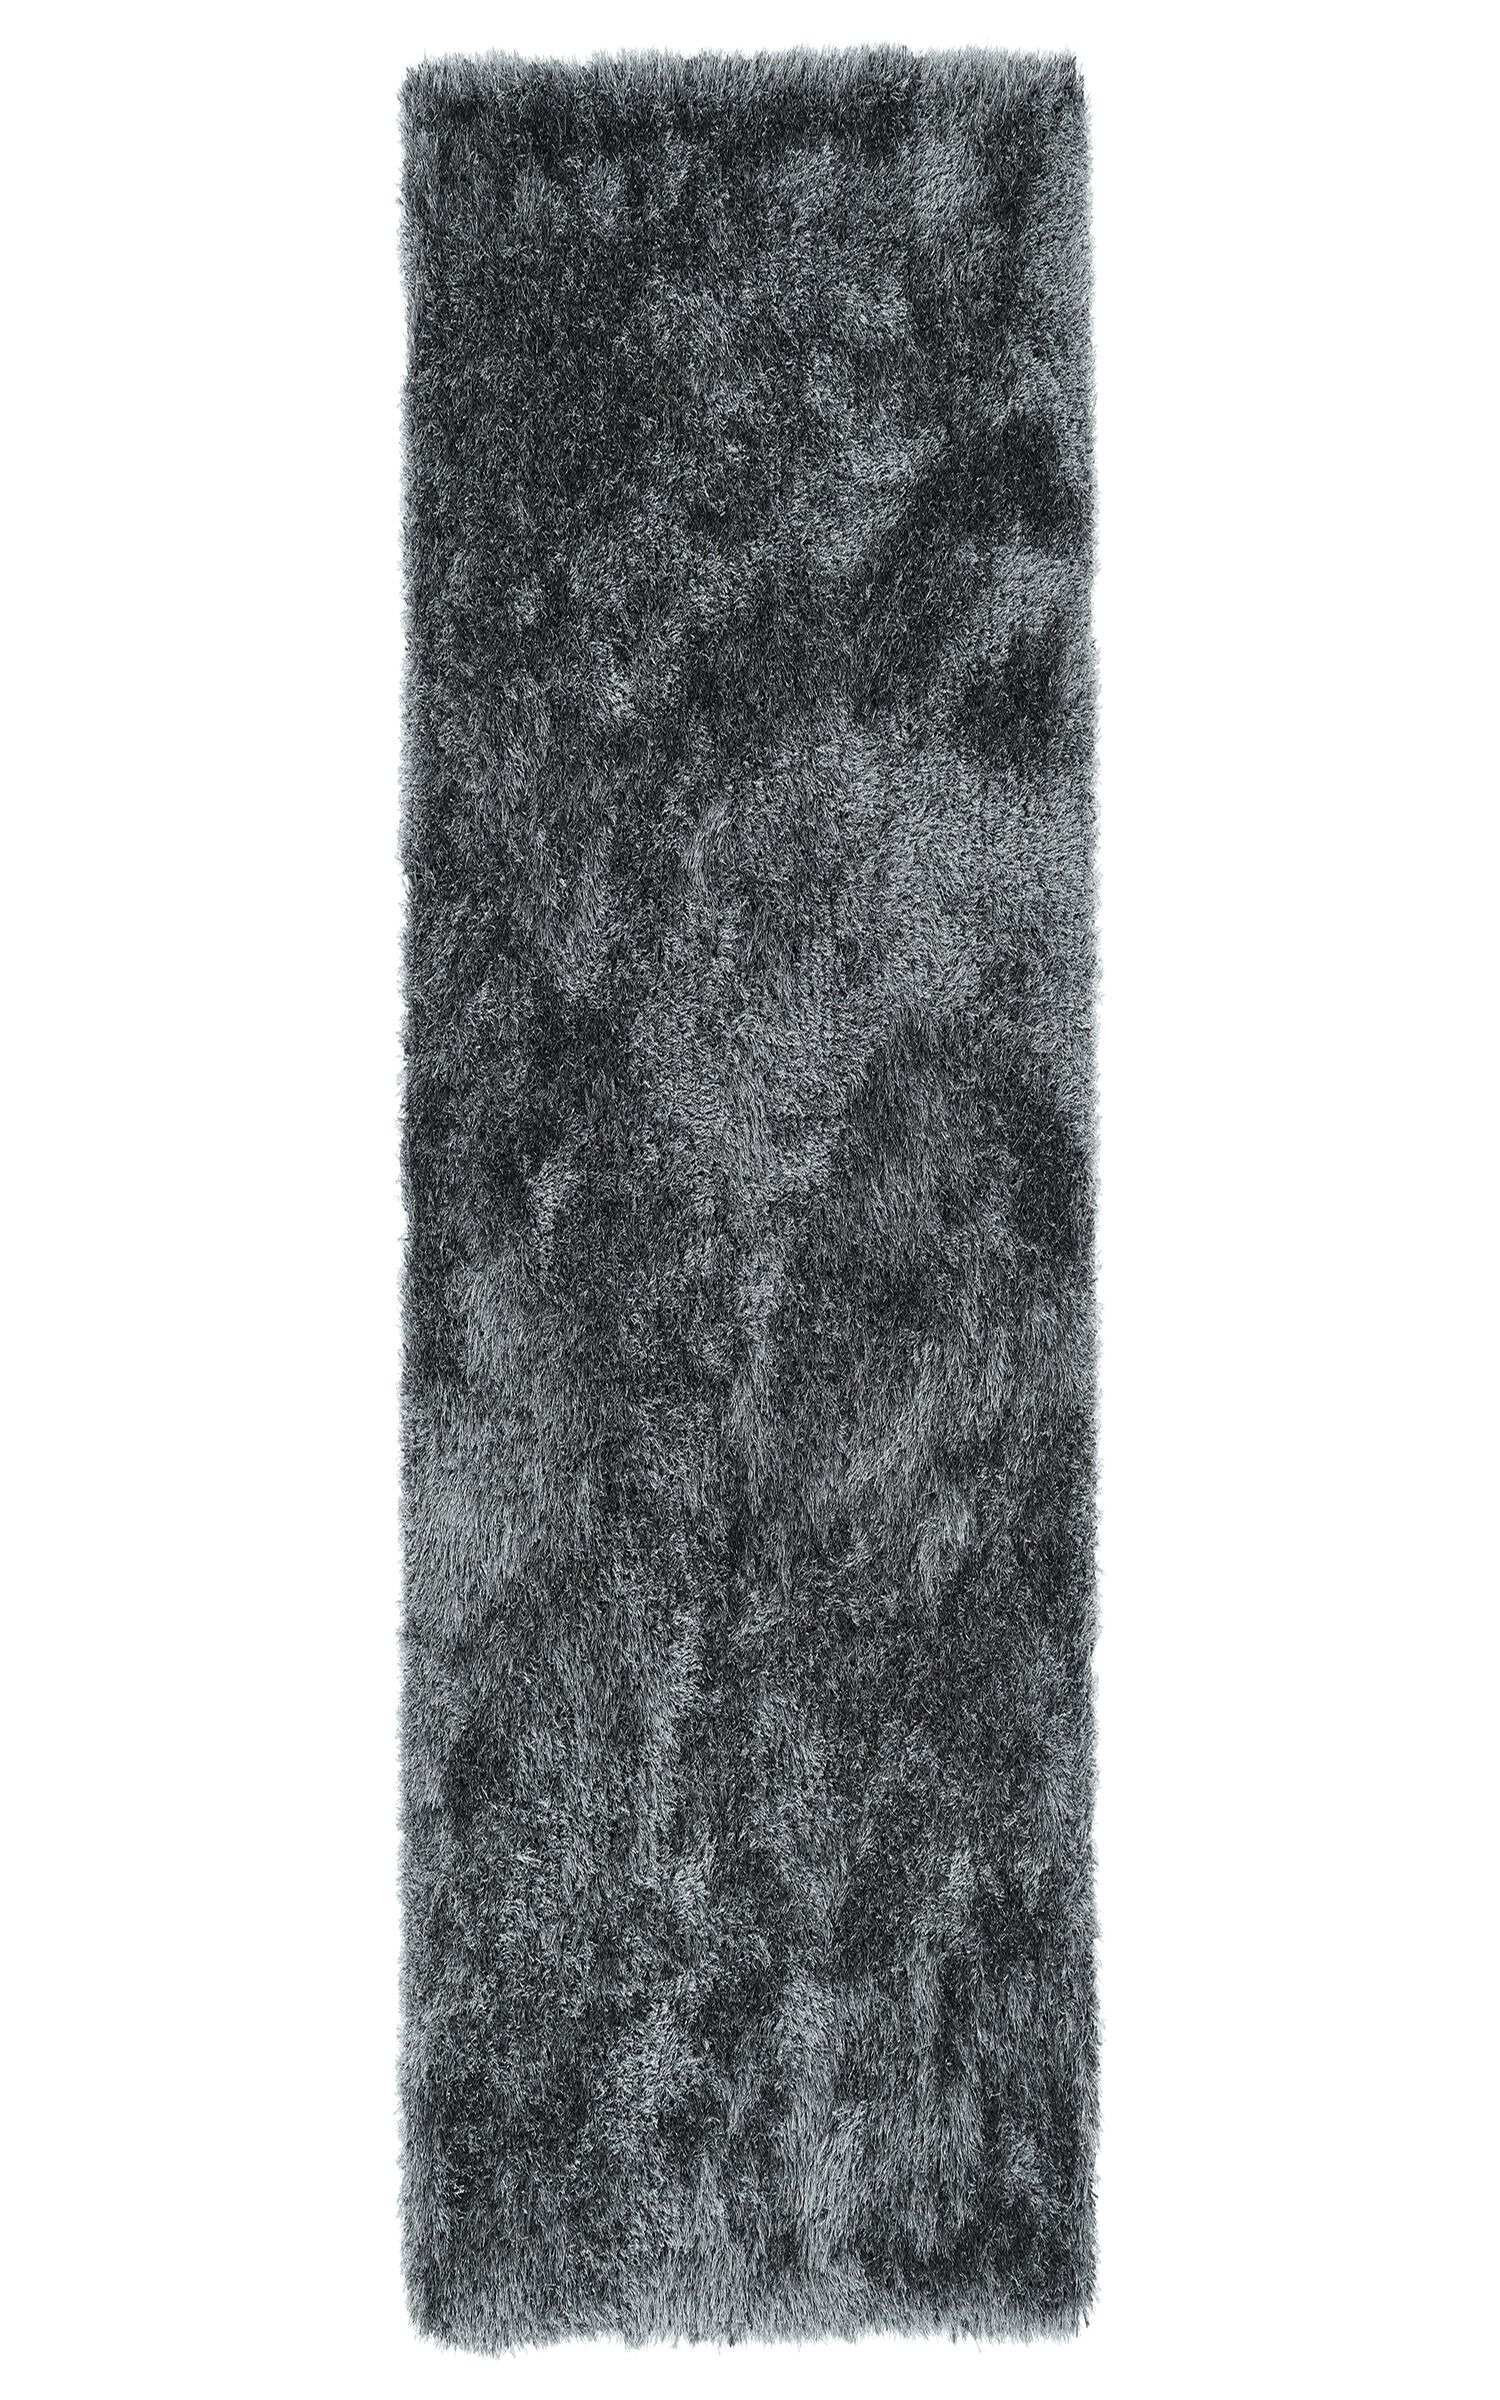 Caine Grey Area Rug Rug Size: Runner 2'3